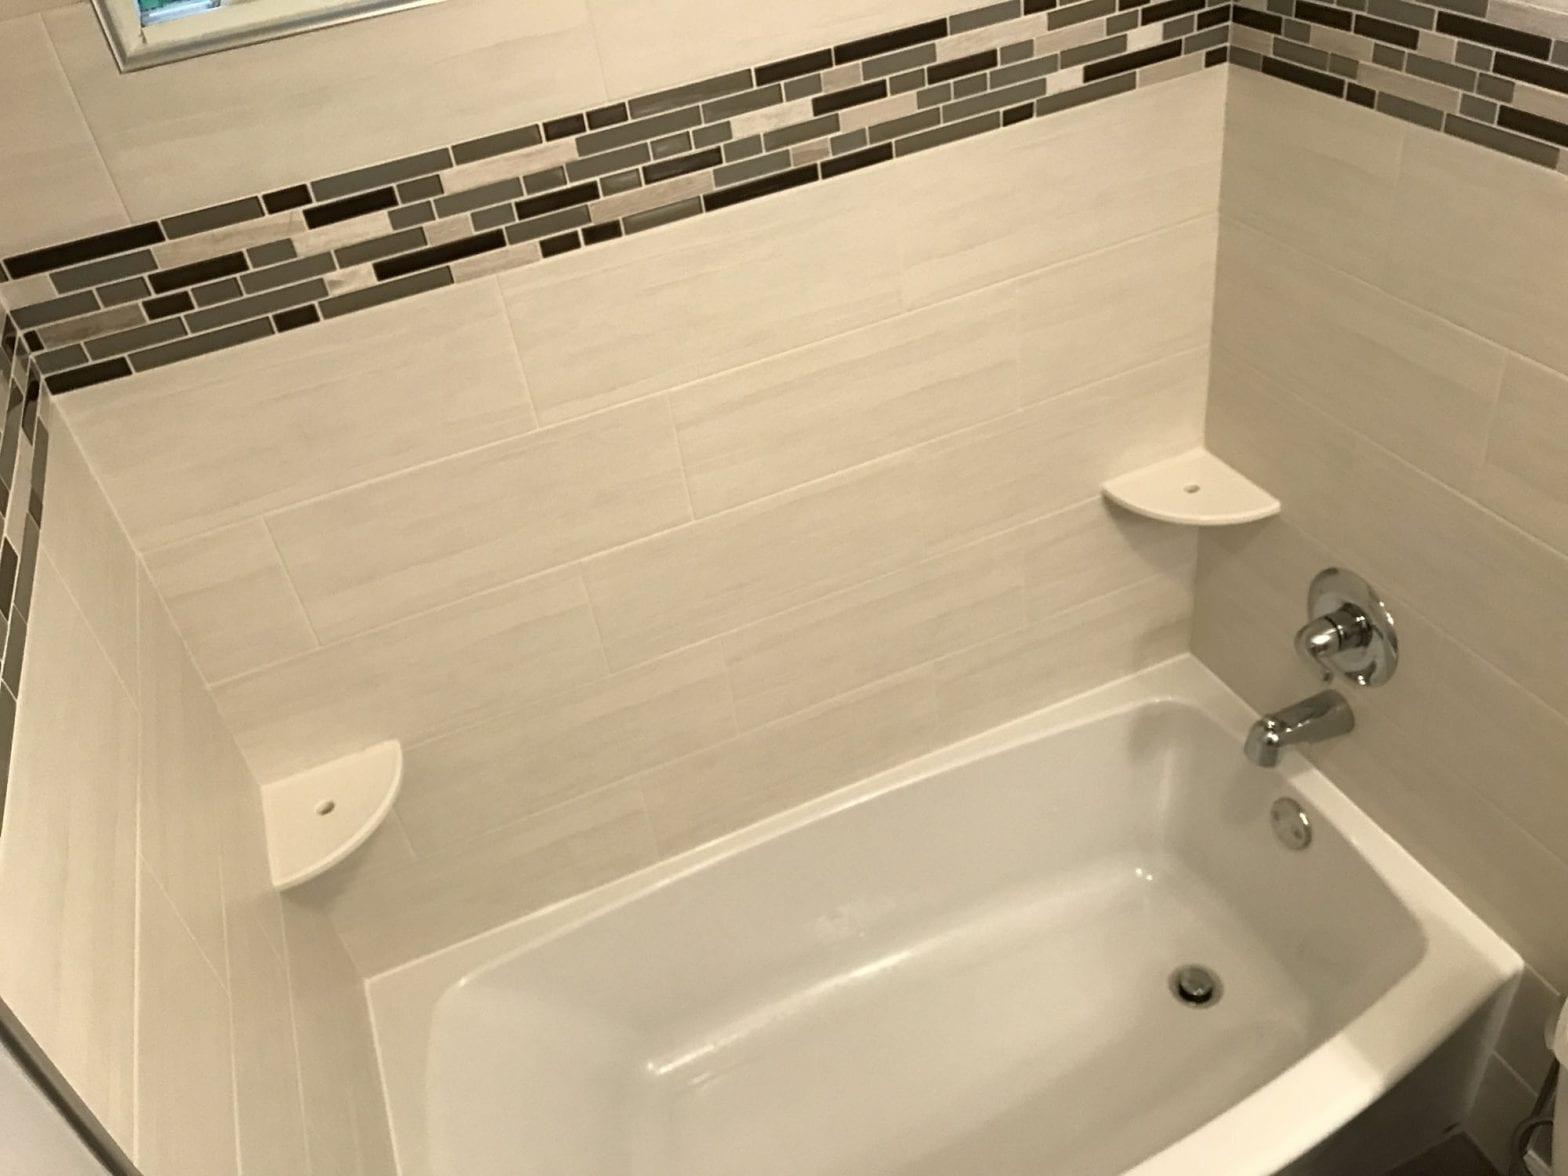 Bathroom remodeling in Hanover Park - new tile, tub